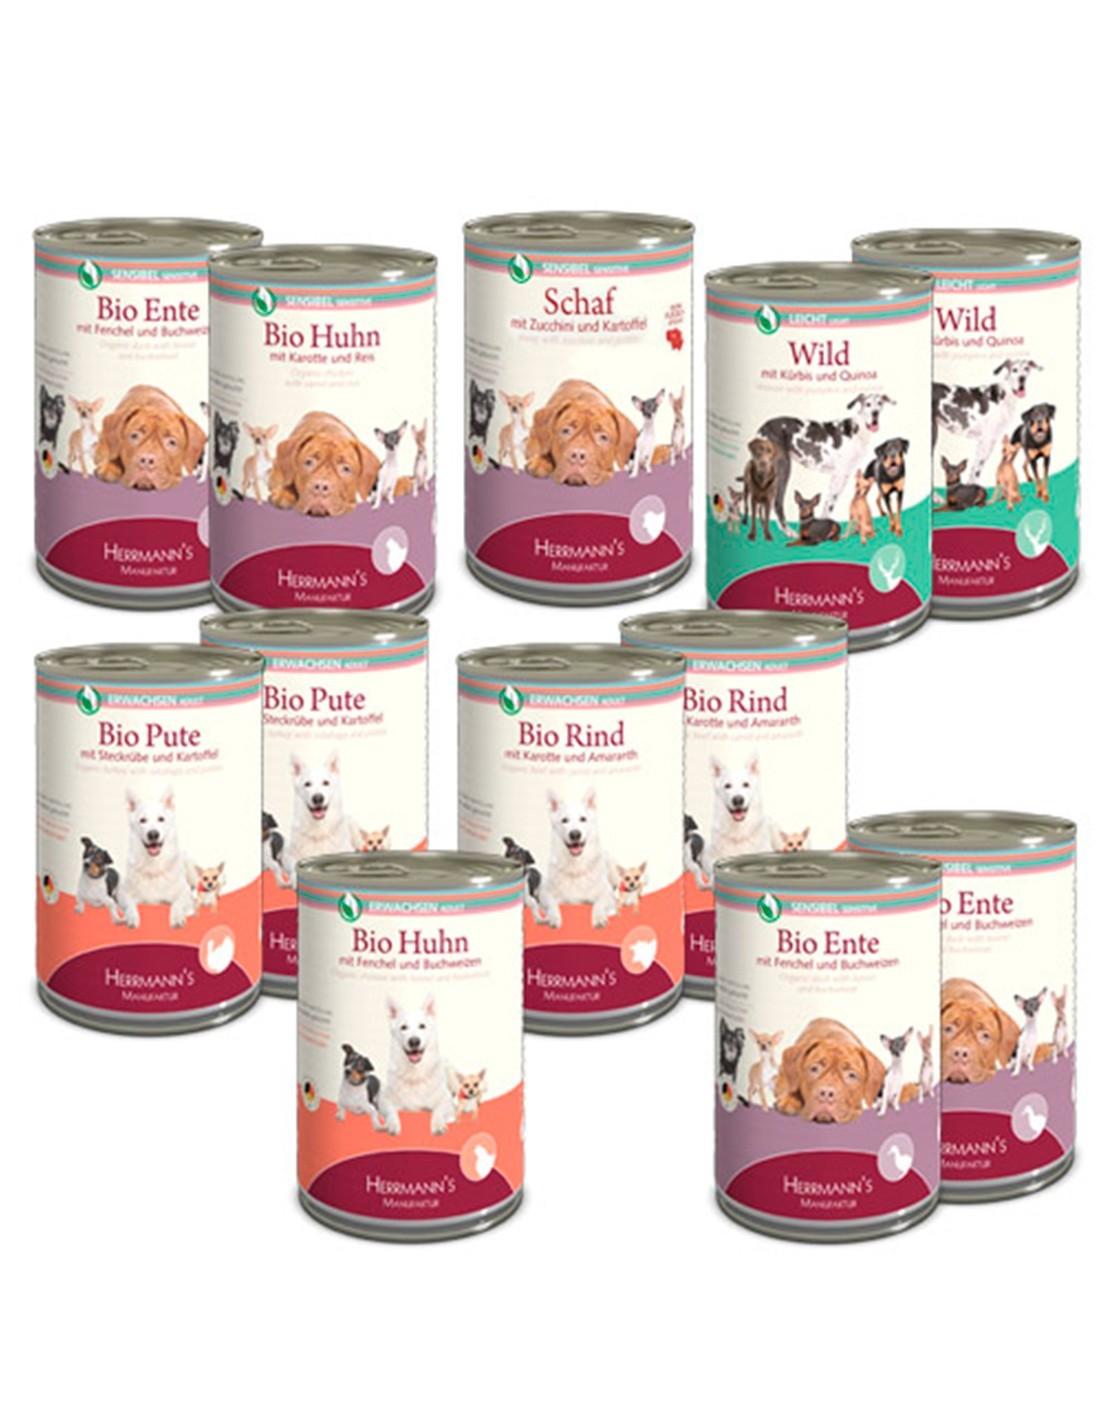 HERRMANN'S Pack Degustación 12 x 400g comida húmeda perros